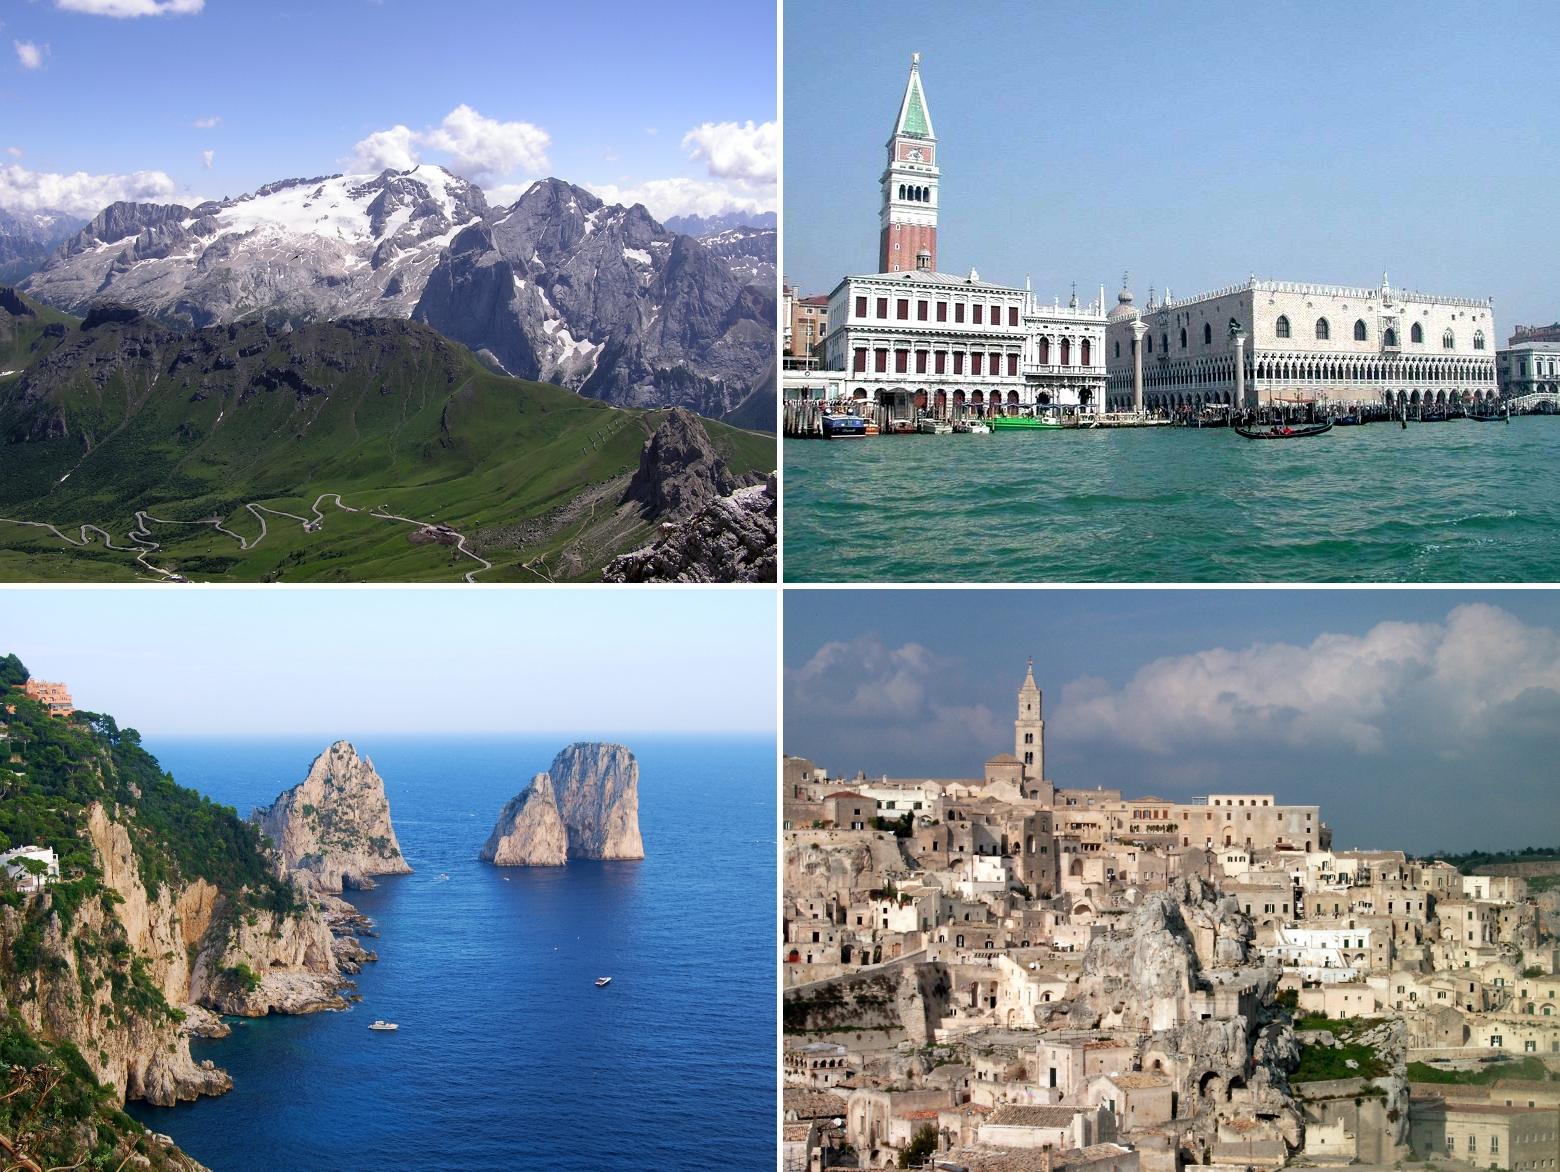 File:Collage turismo Italia.jpg - Wikimedia Commons